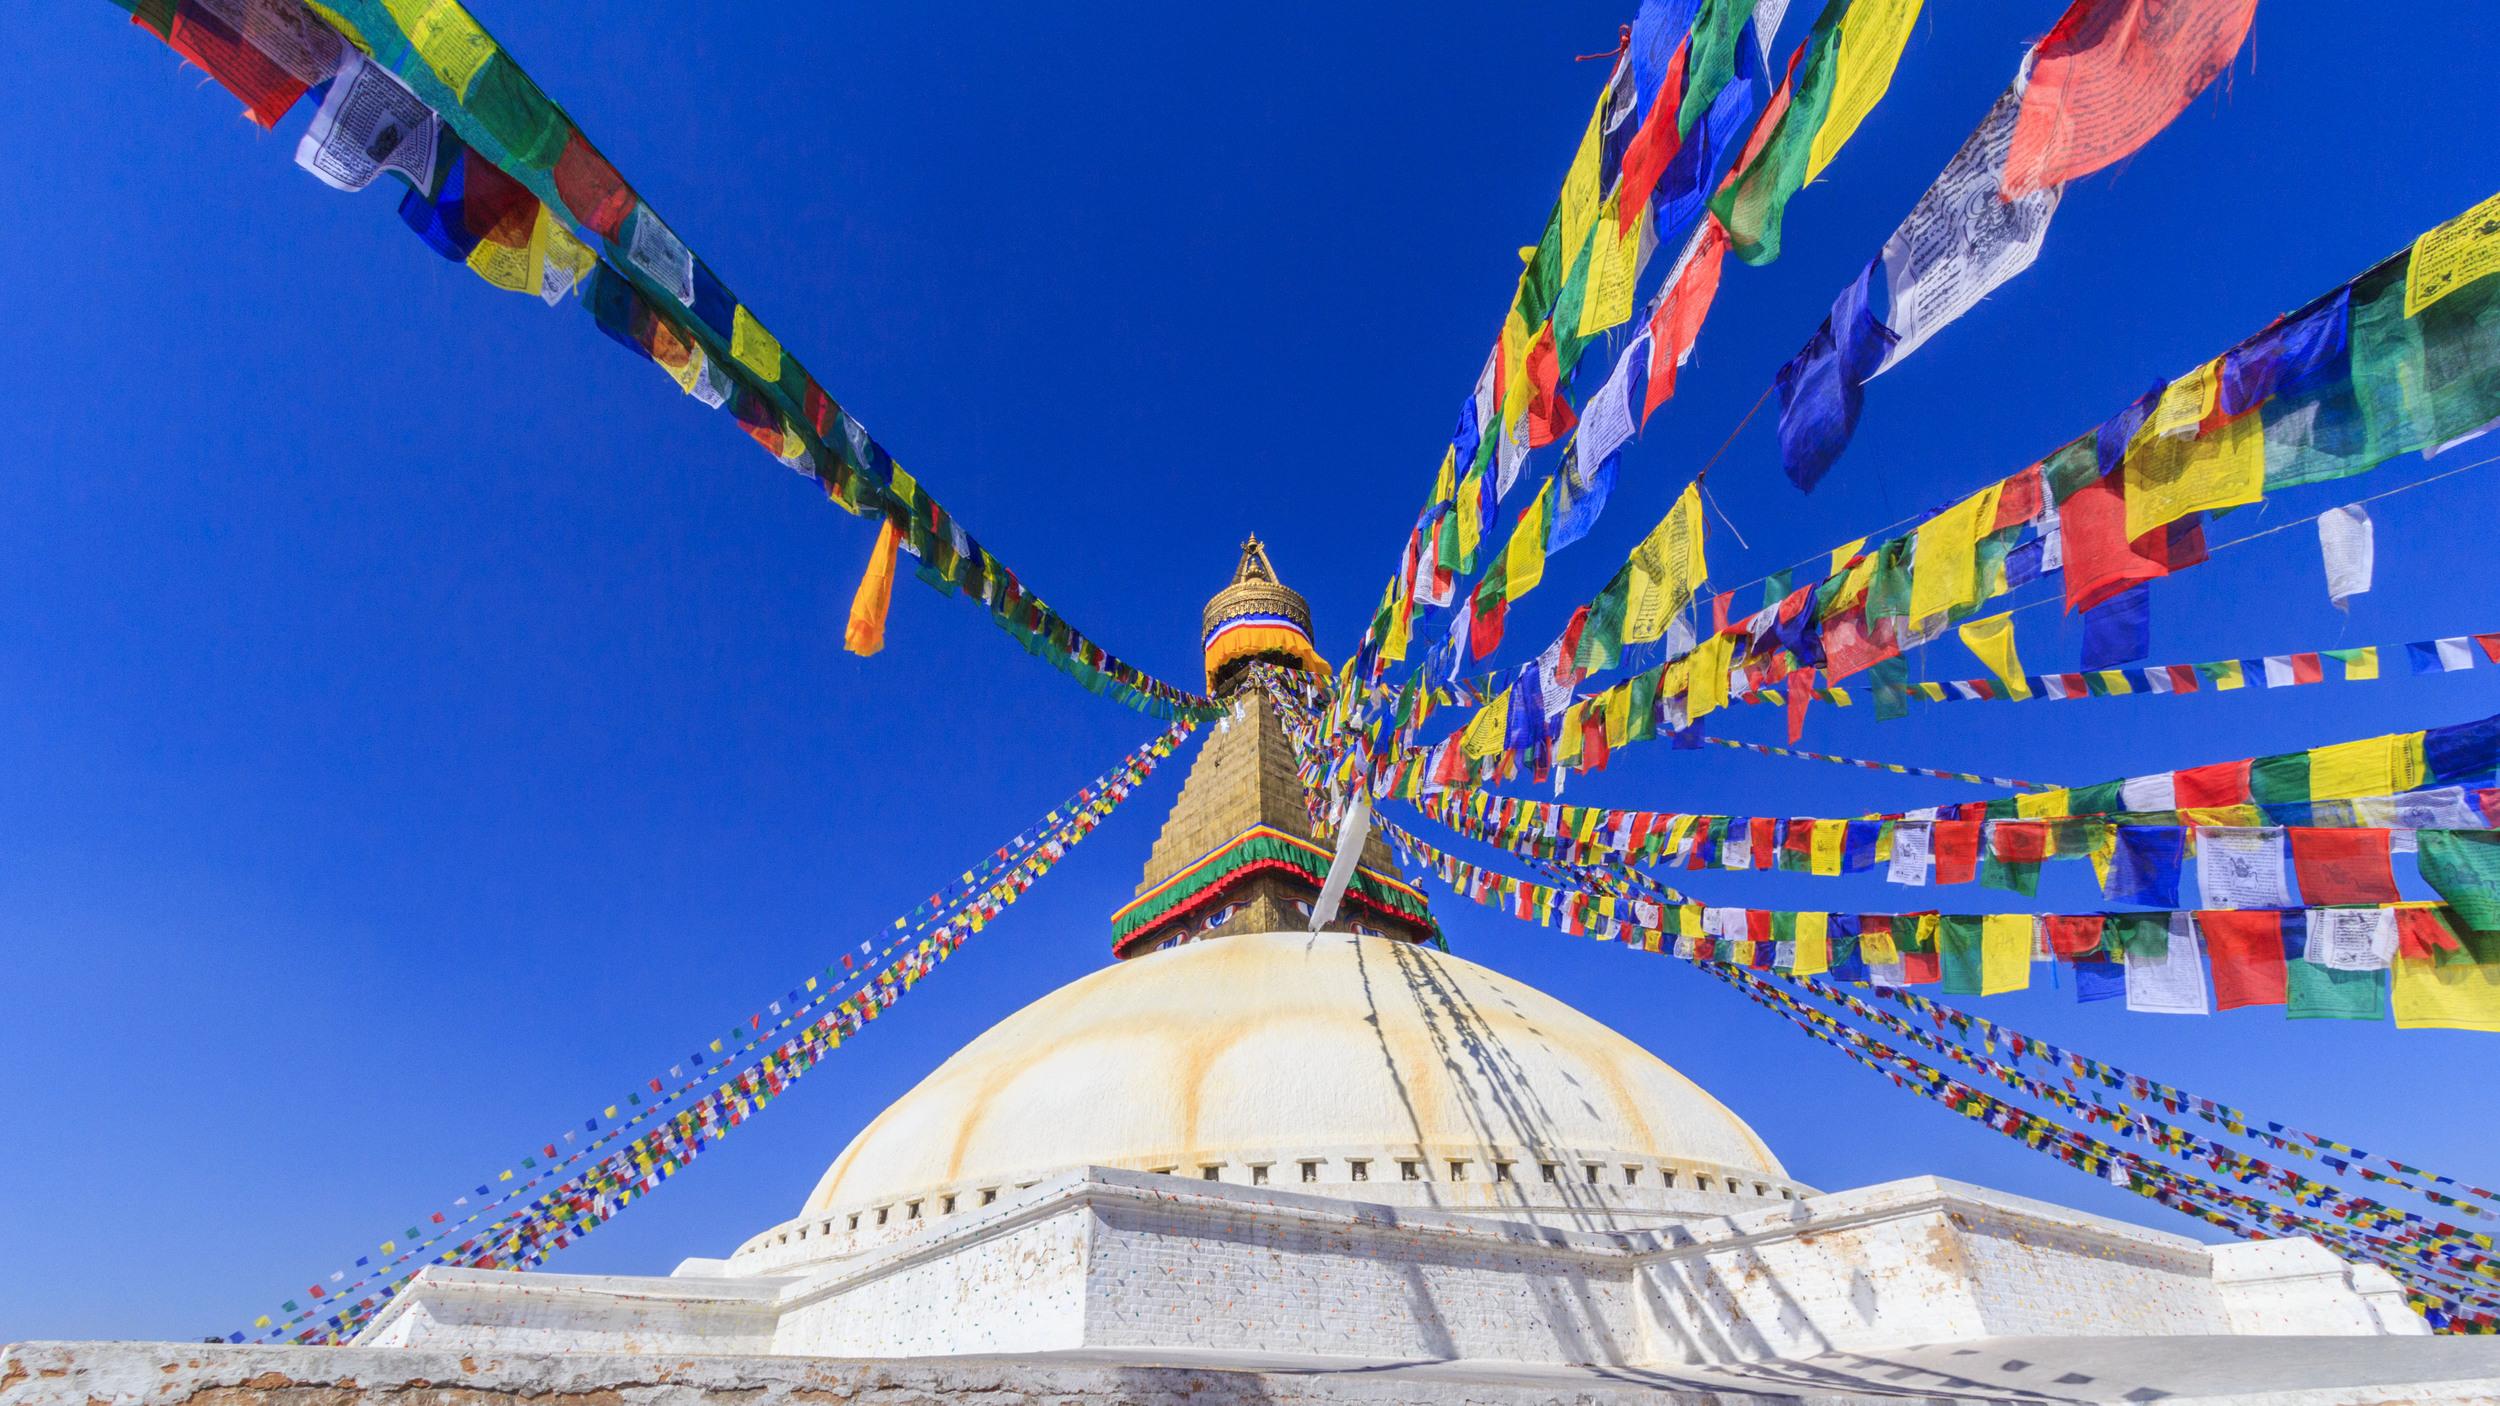 A World Heritage Site. The Boudhanath Stupa.